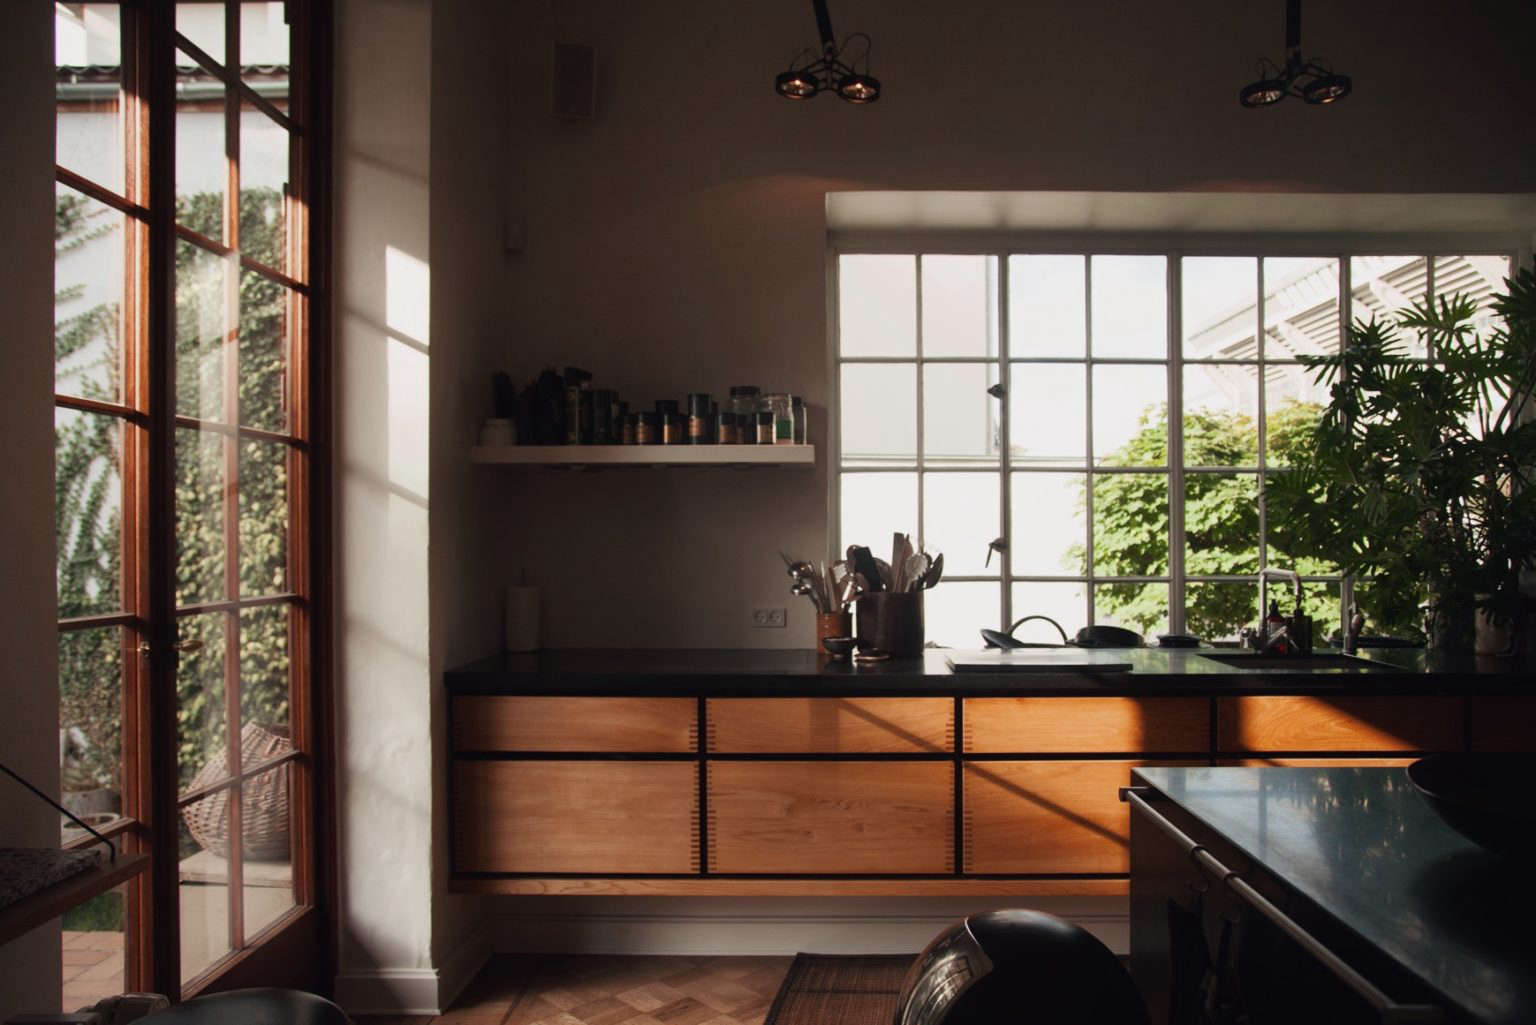 susanne rutzou apartment kitchen